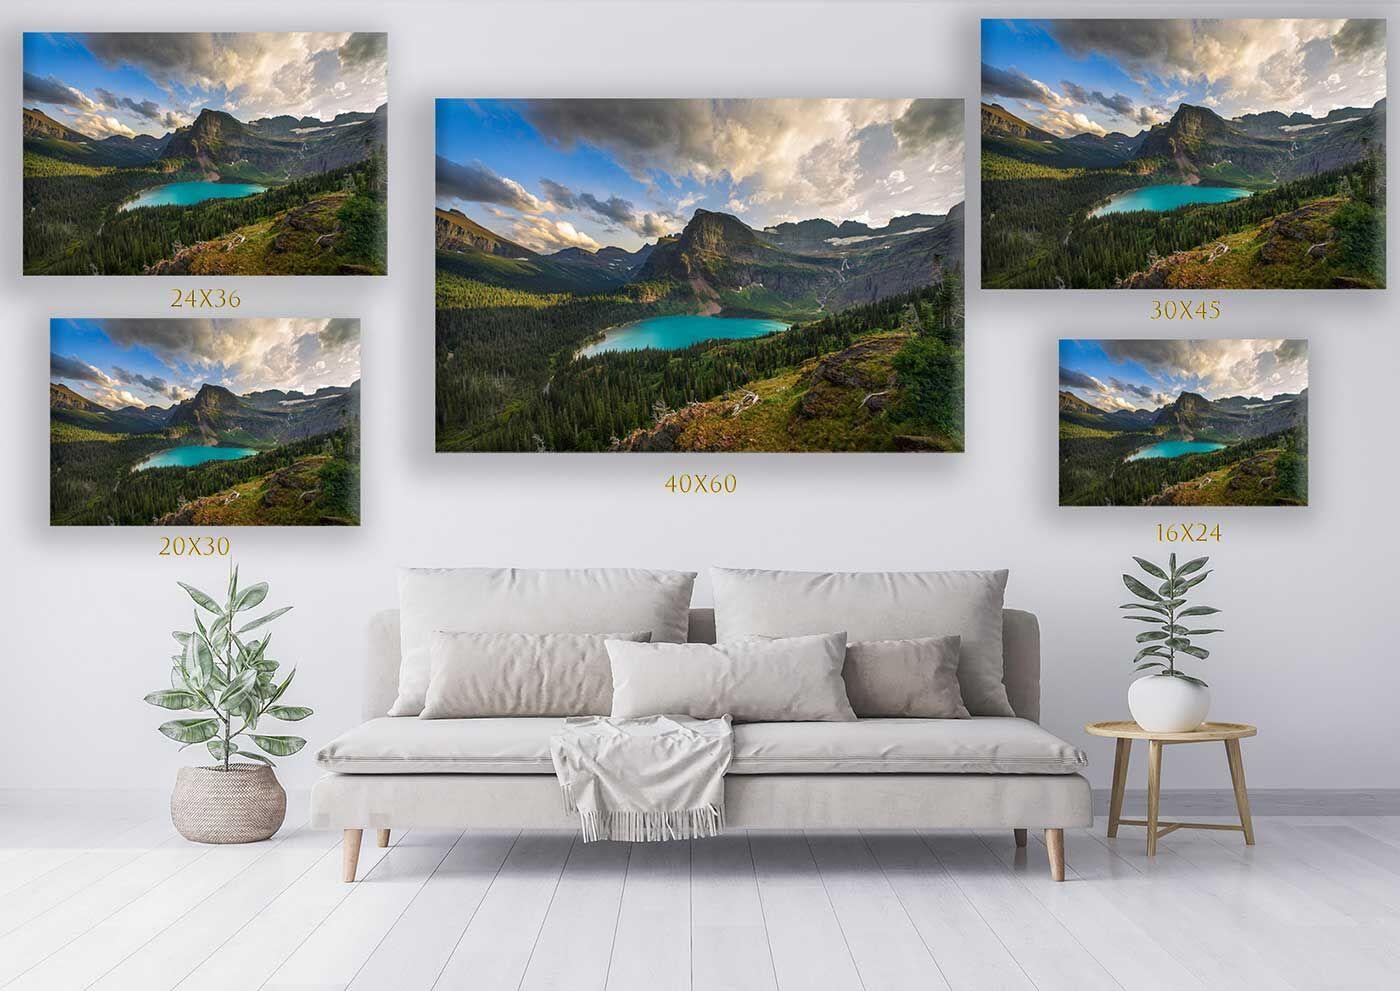 Print Size Comparison on Wall w Sofa